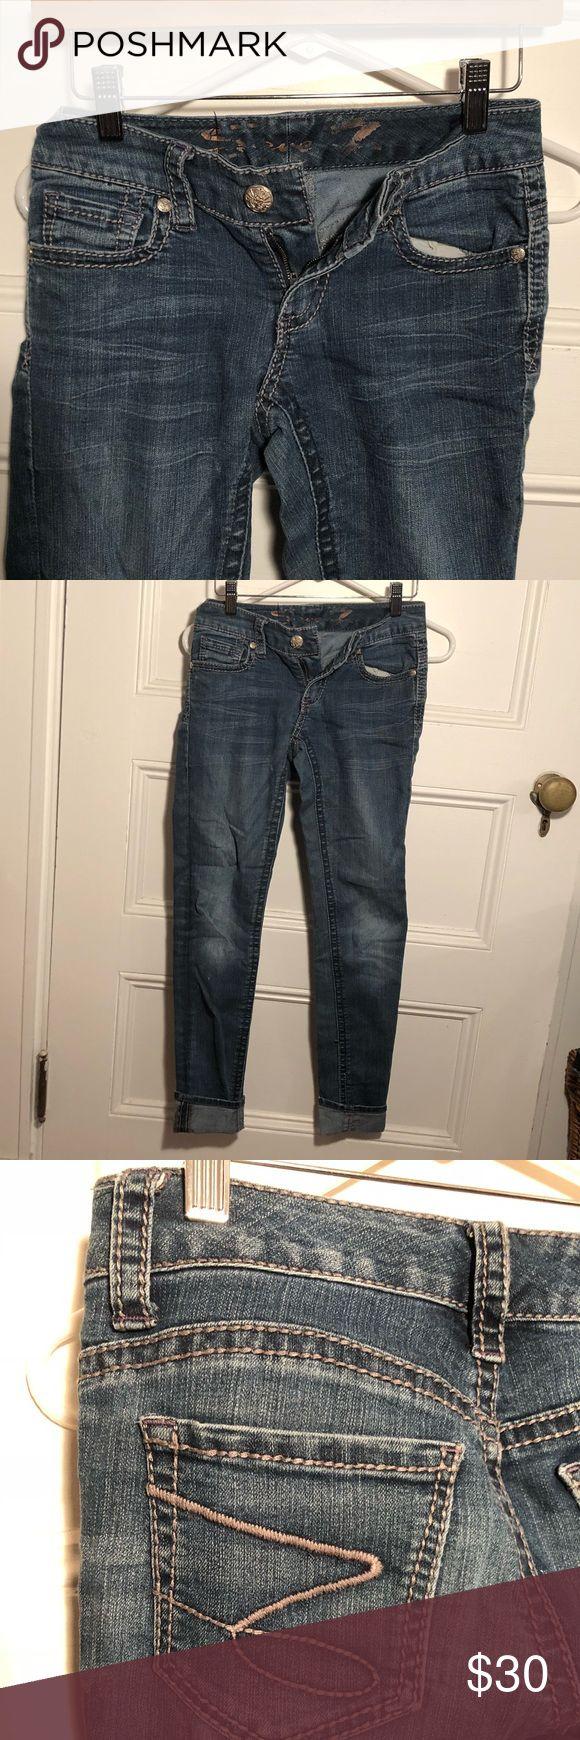 Skinny Jeans Low rise Seven for all Man Kind skinny jeans. Medium wash. Super comfortable. Seven7 Jeans Skinny